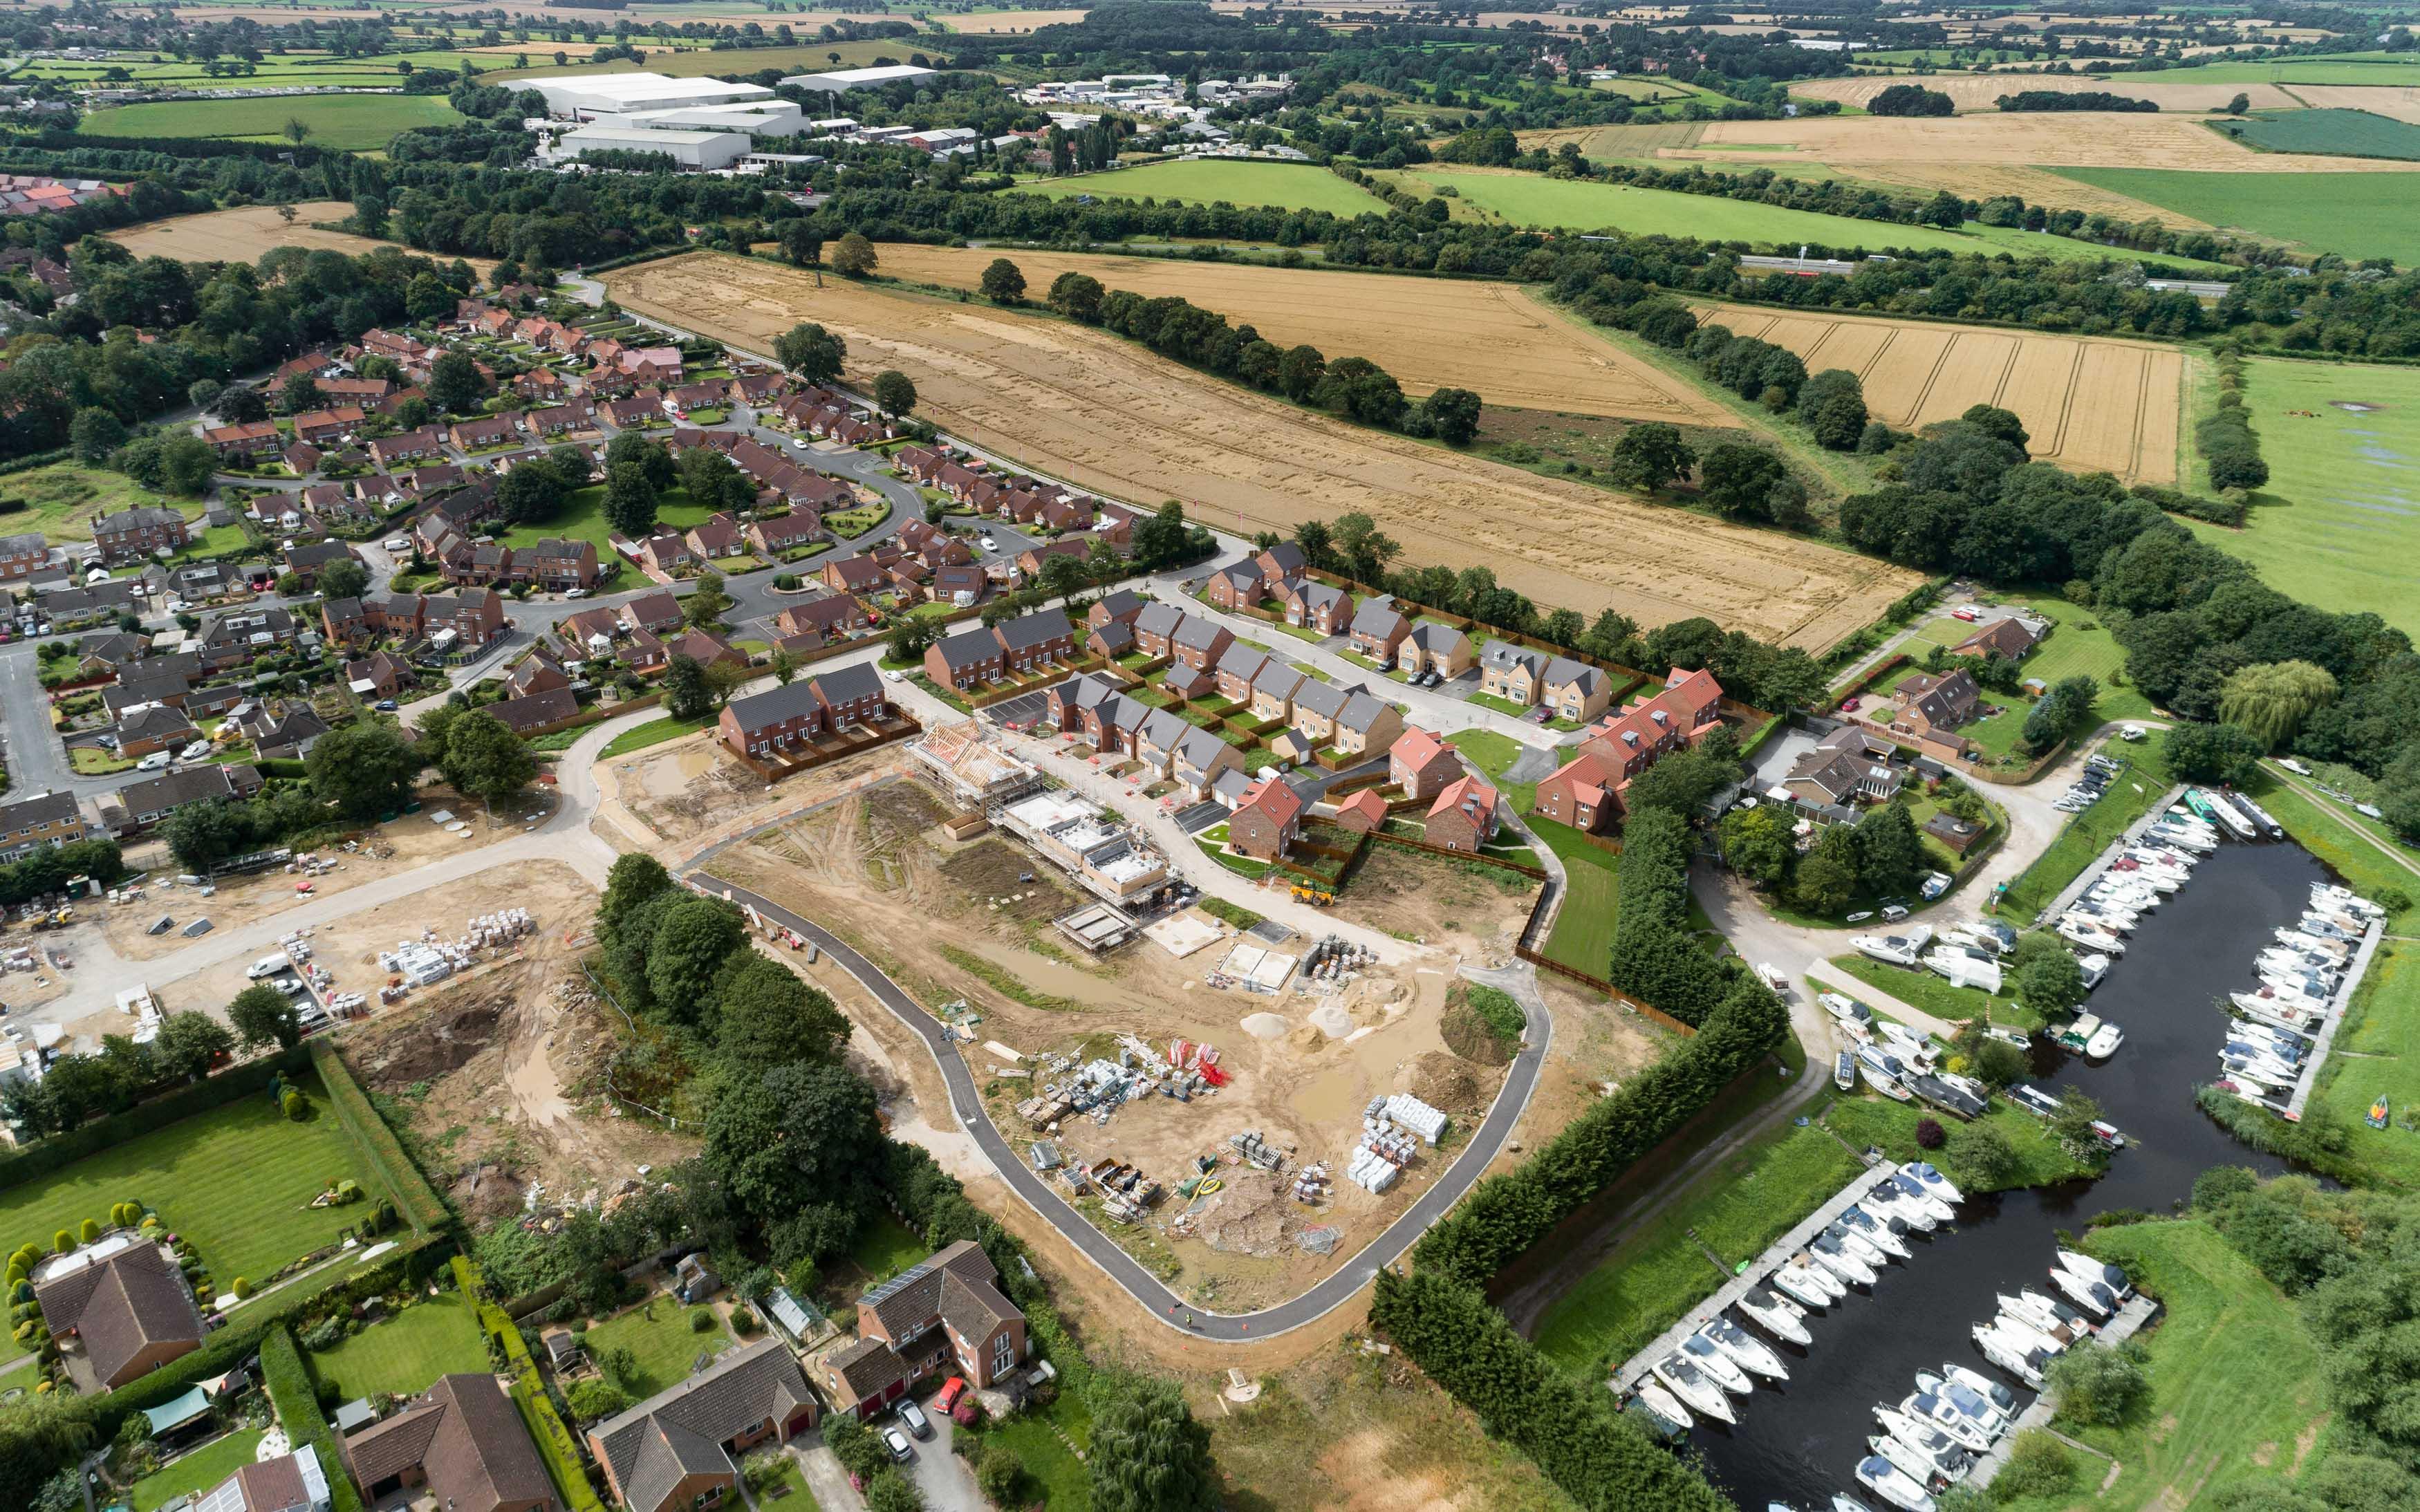 riverside_mills_aerial-2